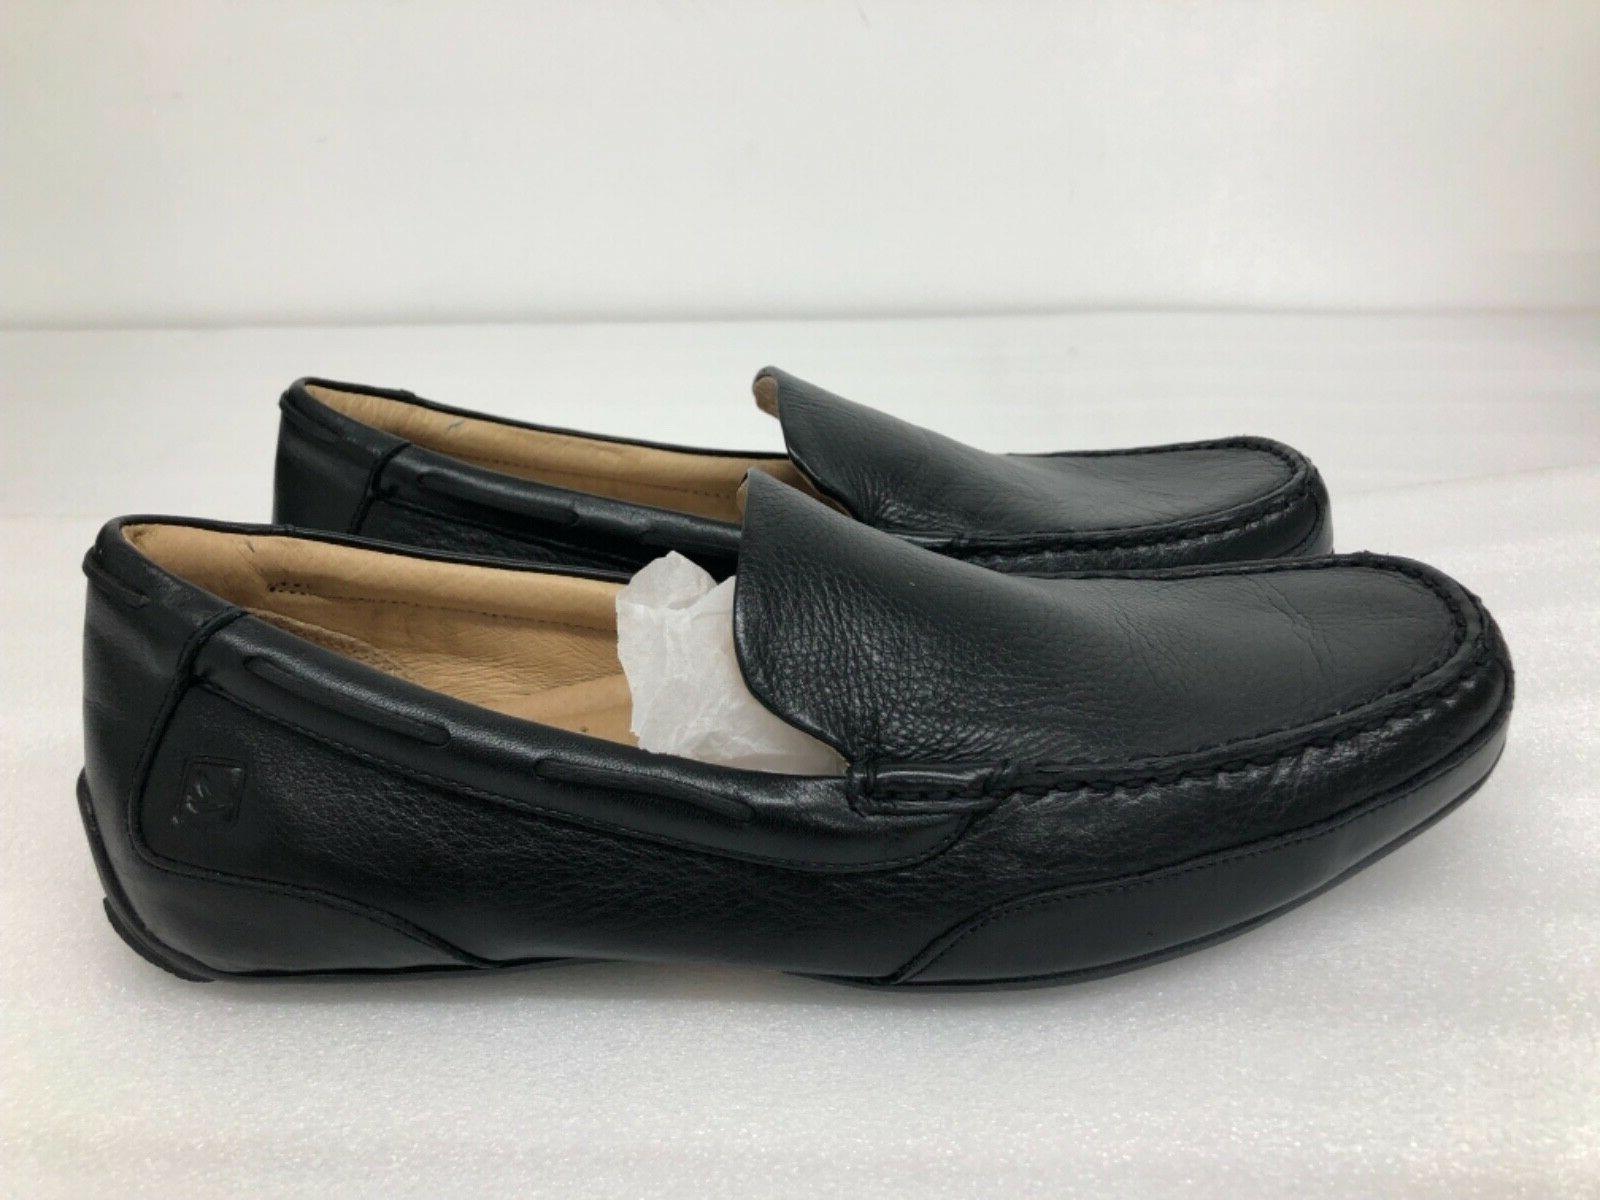 Sperry Top-Sider $90 Men's Loafer Size 13 Black Leather